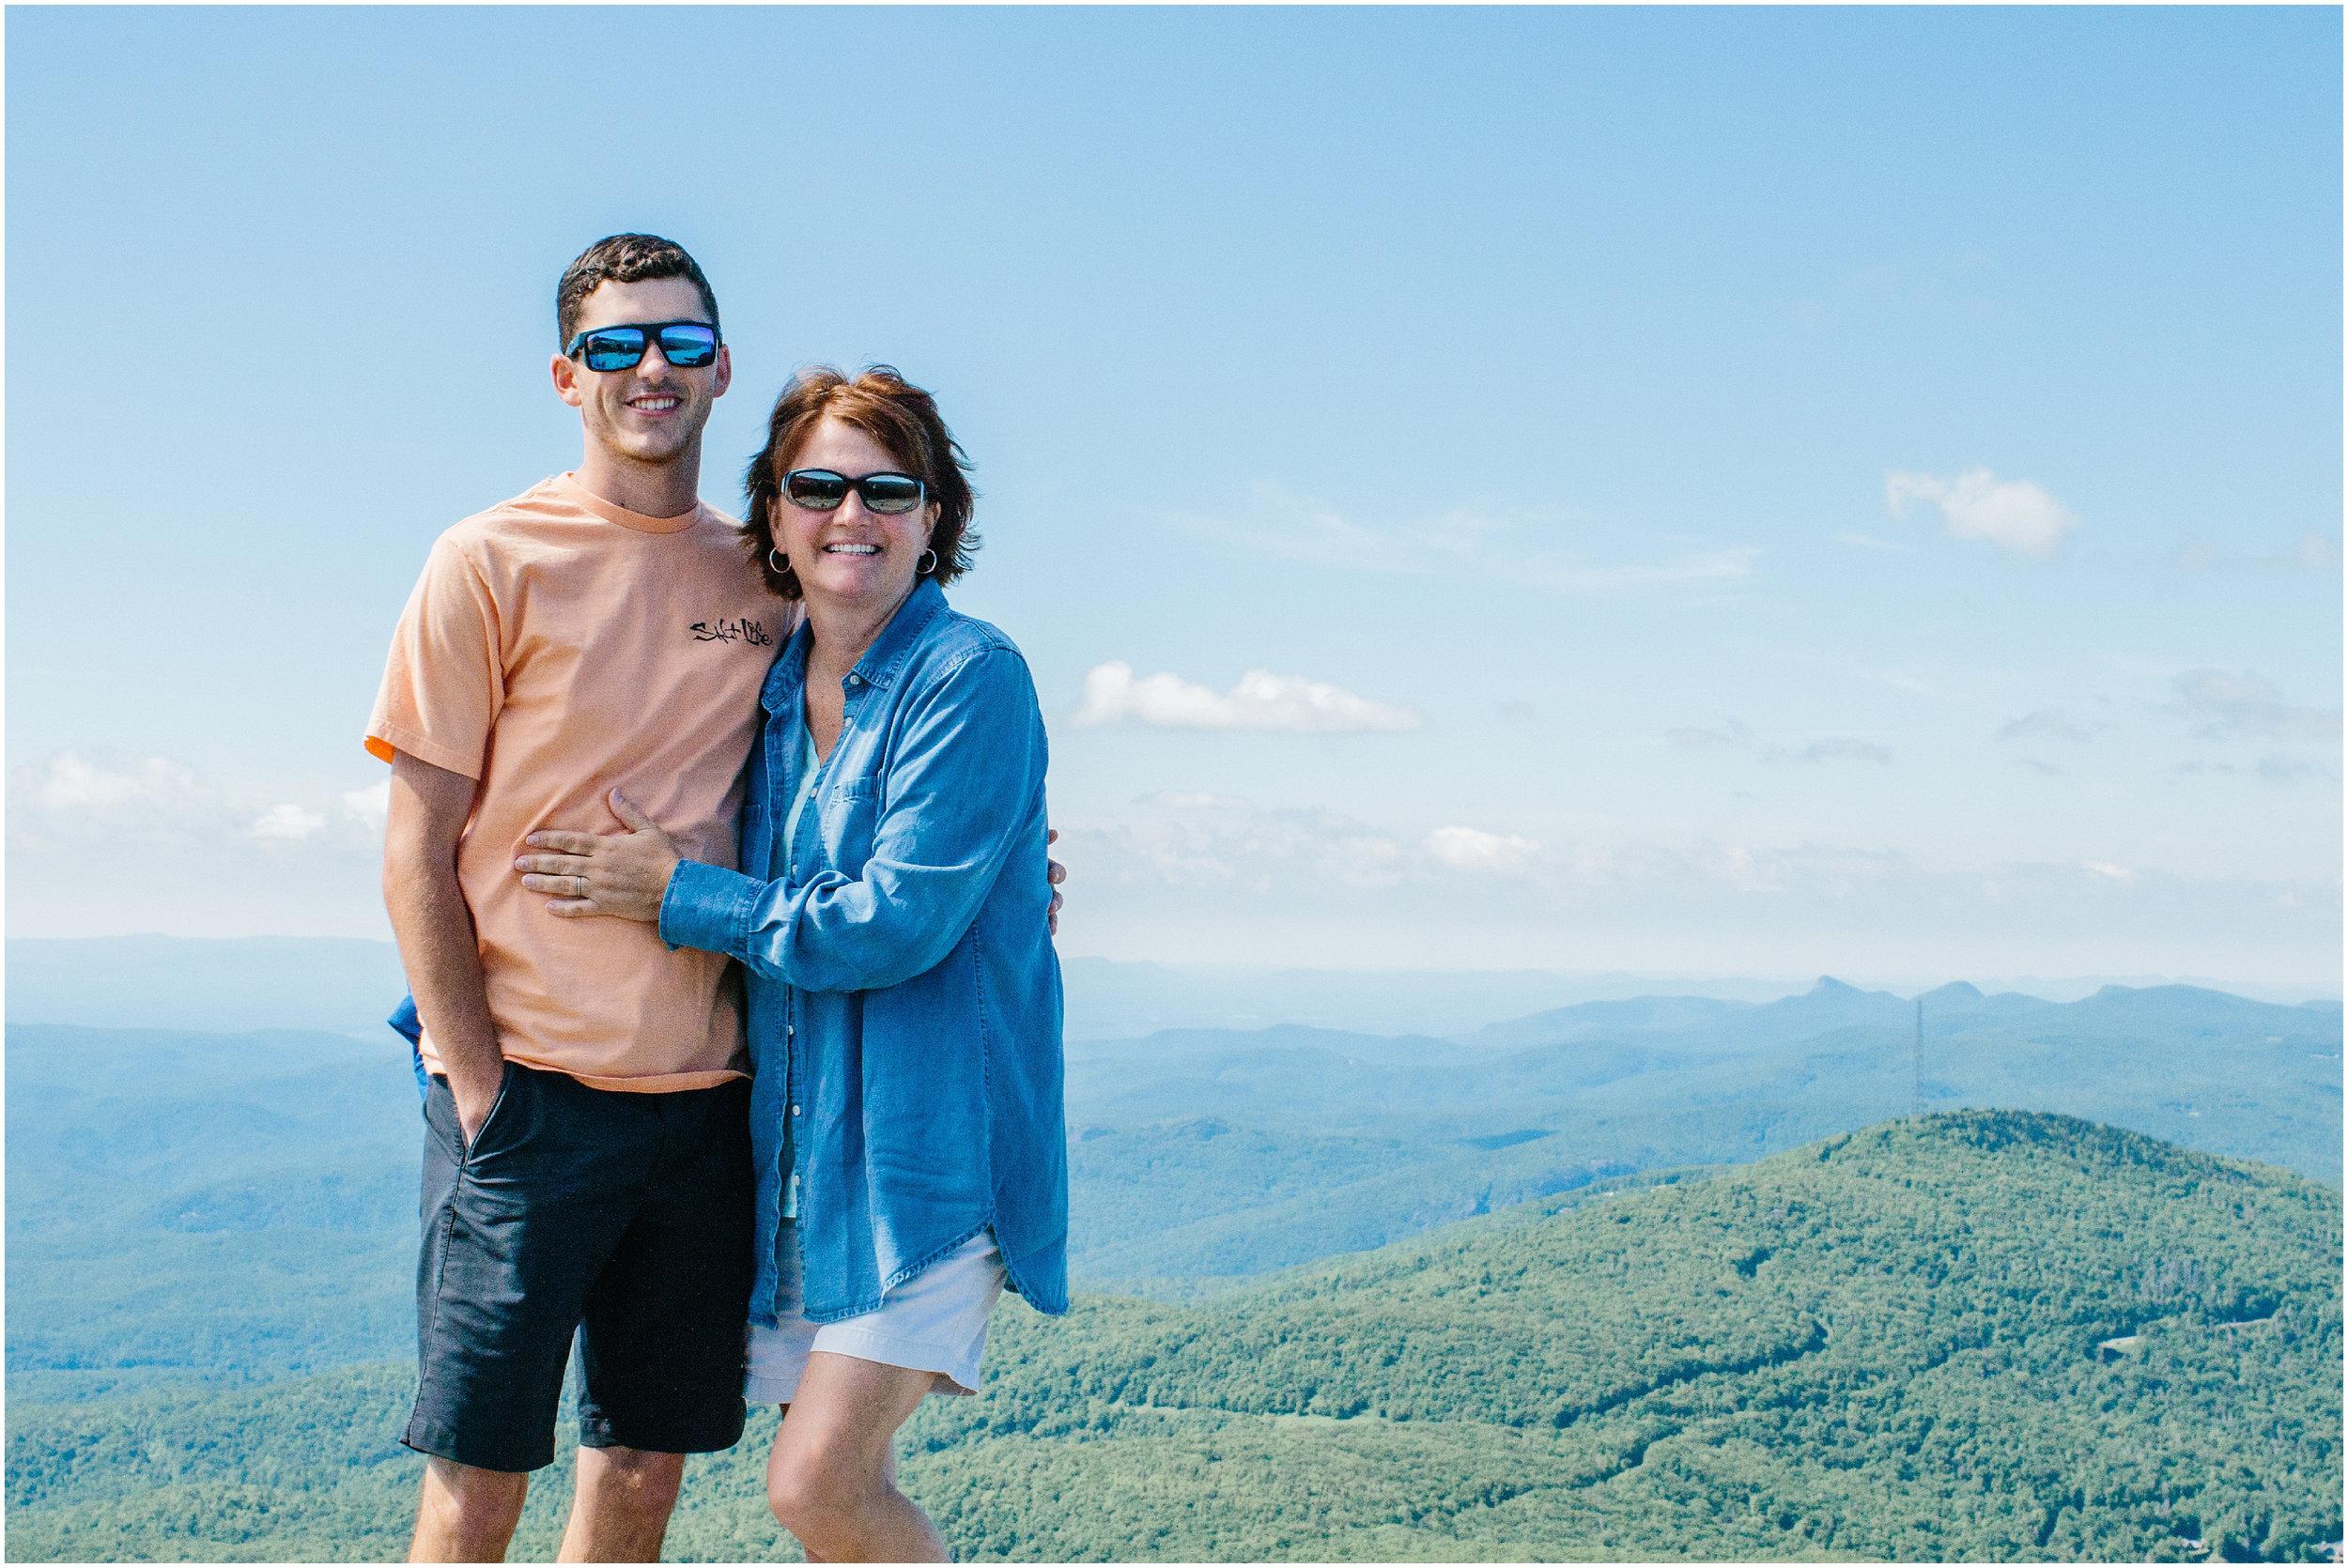 Travel_Photographer_Asheville_NorthCarolina-16.jpg